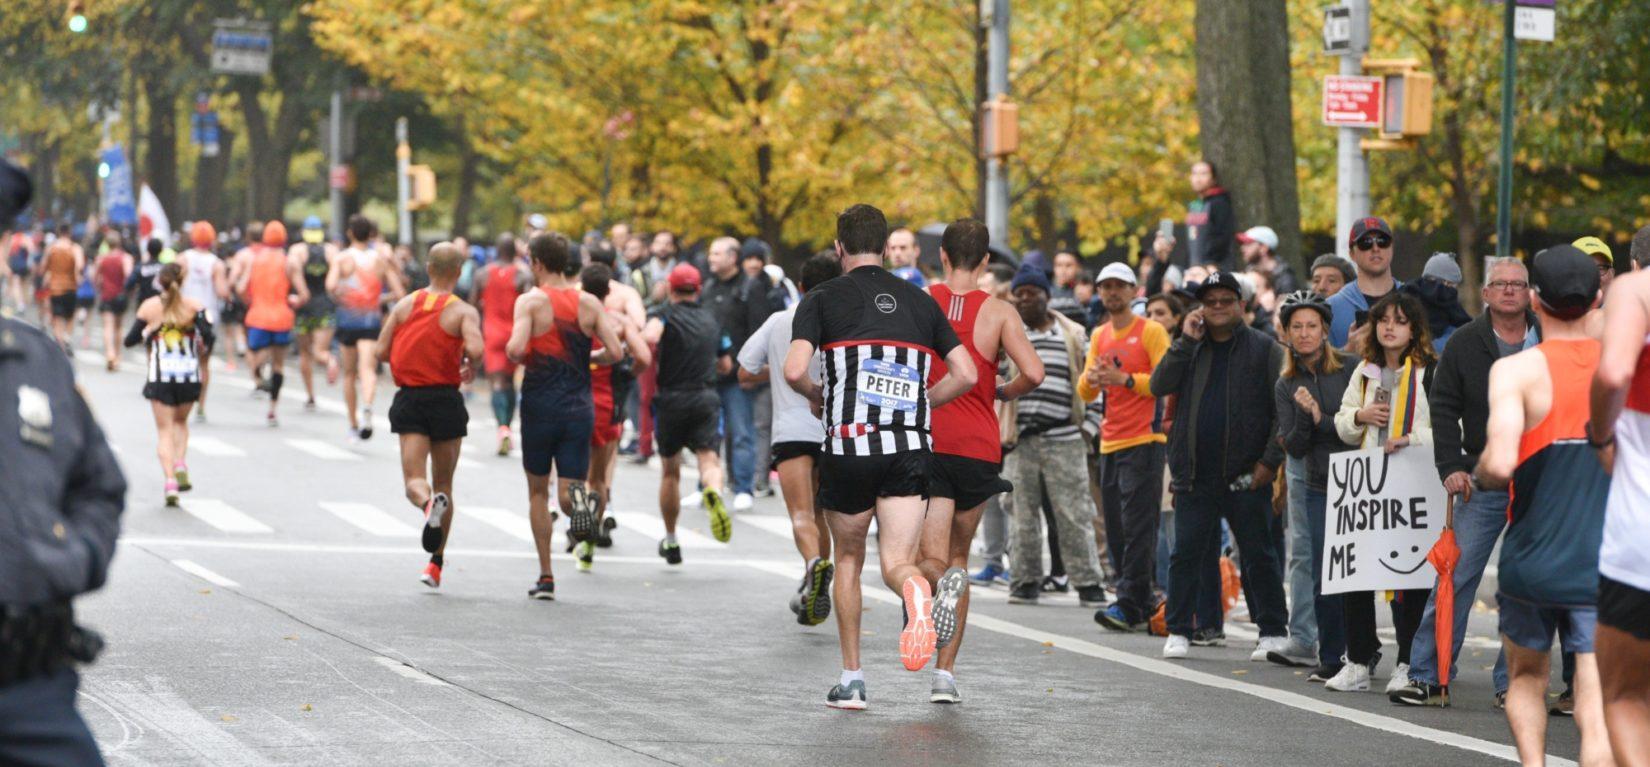 Marathoners making their way through Central Park